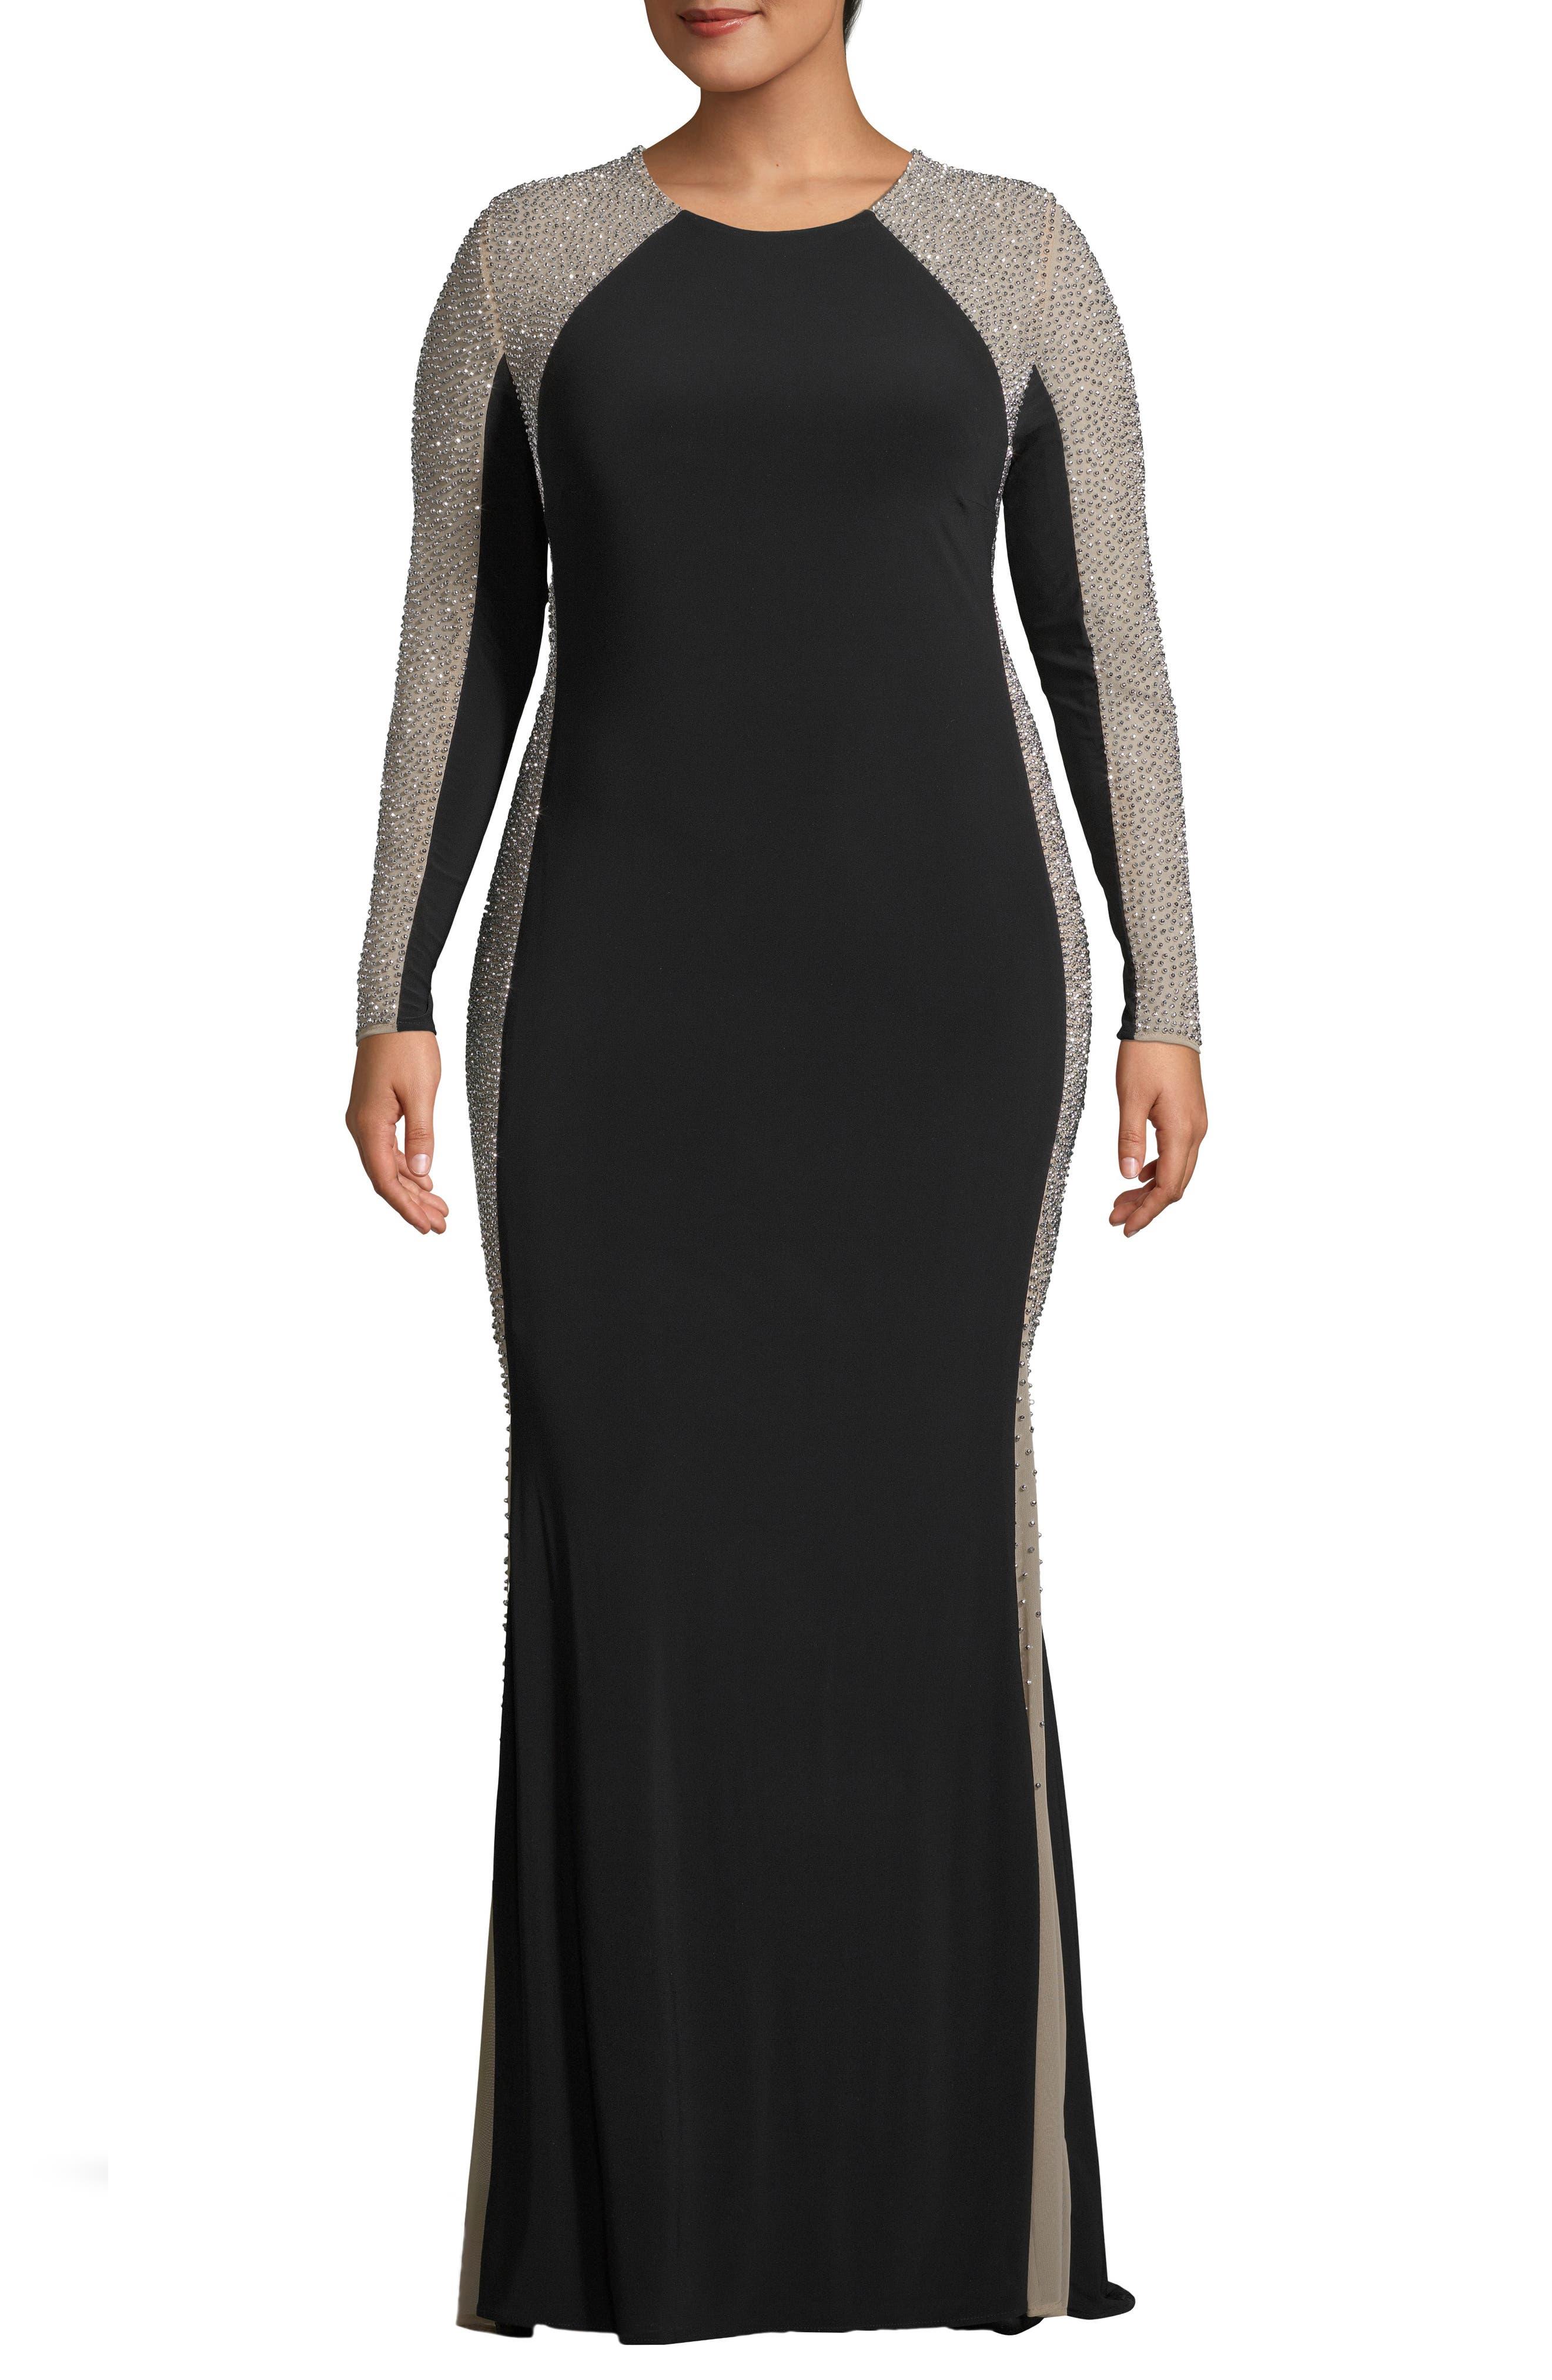 Plus Size Xscape Caviar Bead Dress, Black